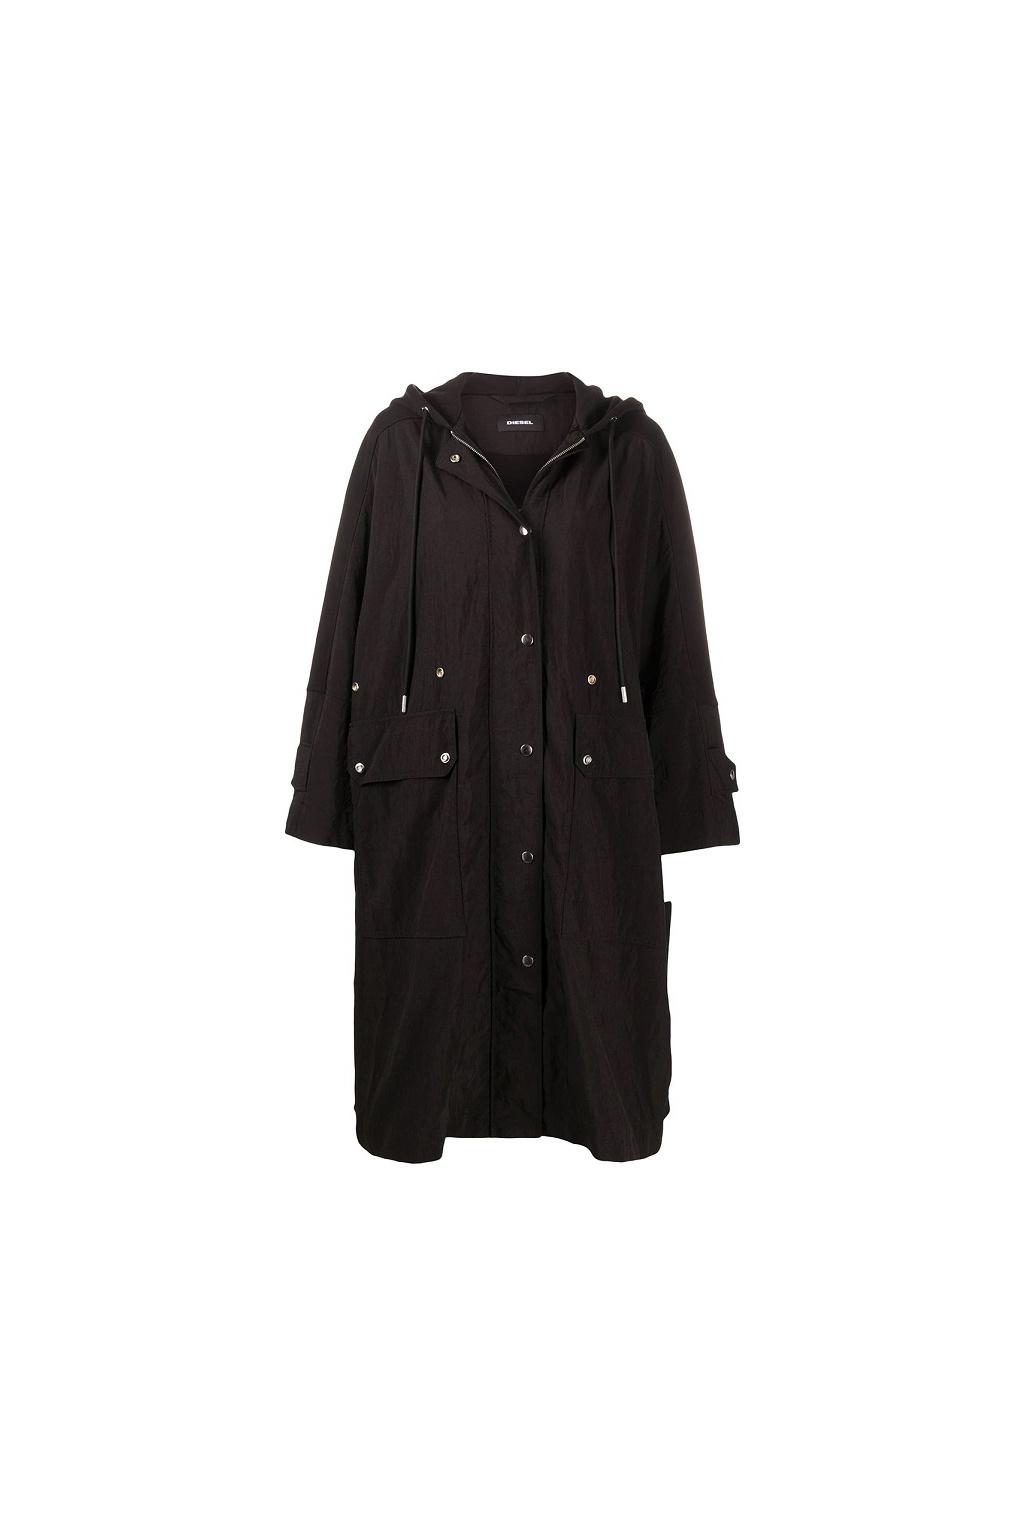 A00048 0LAYP 9XX Dámský kabát Diesel G alaxy černý